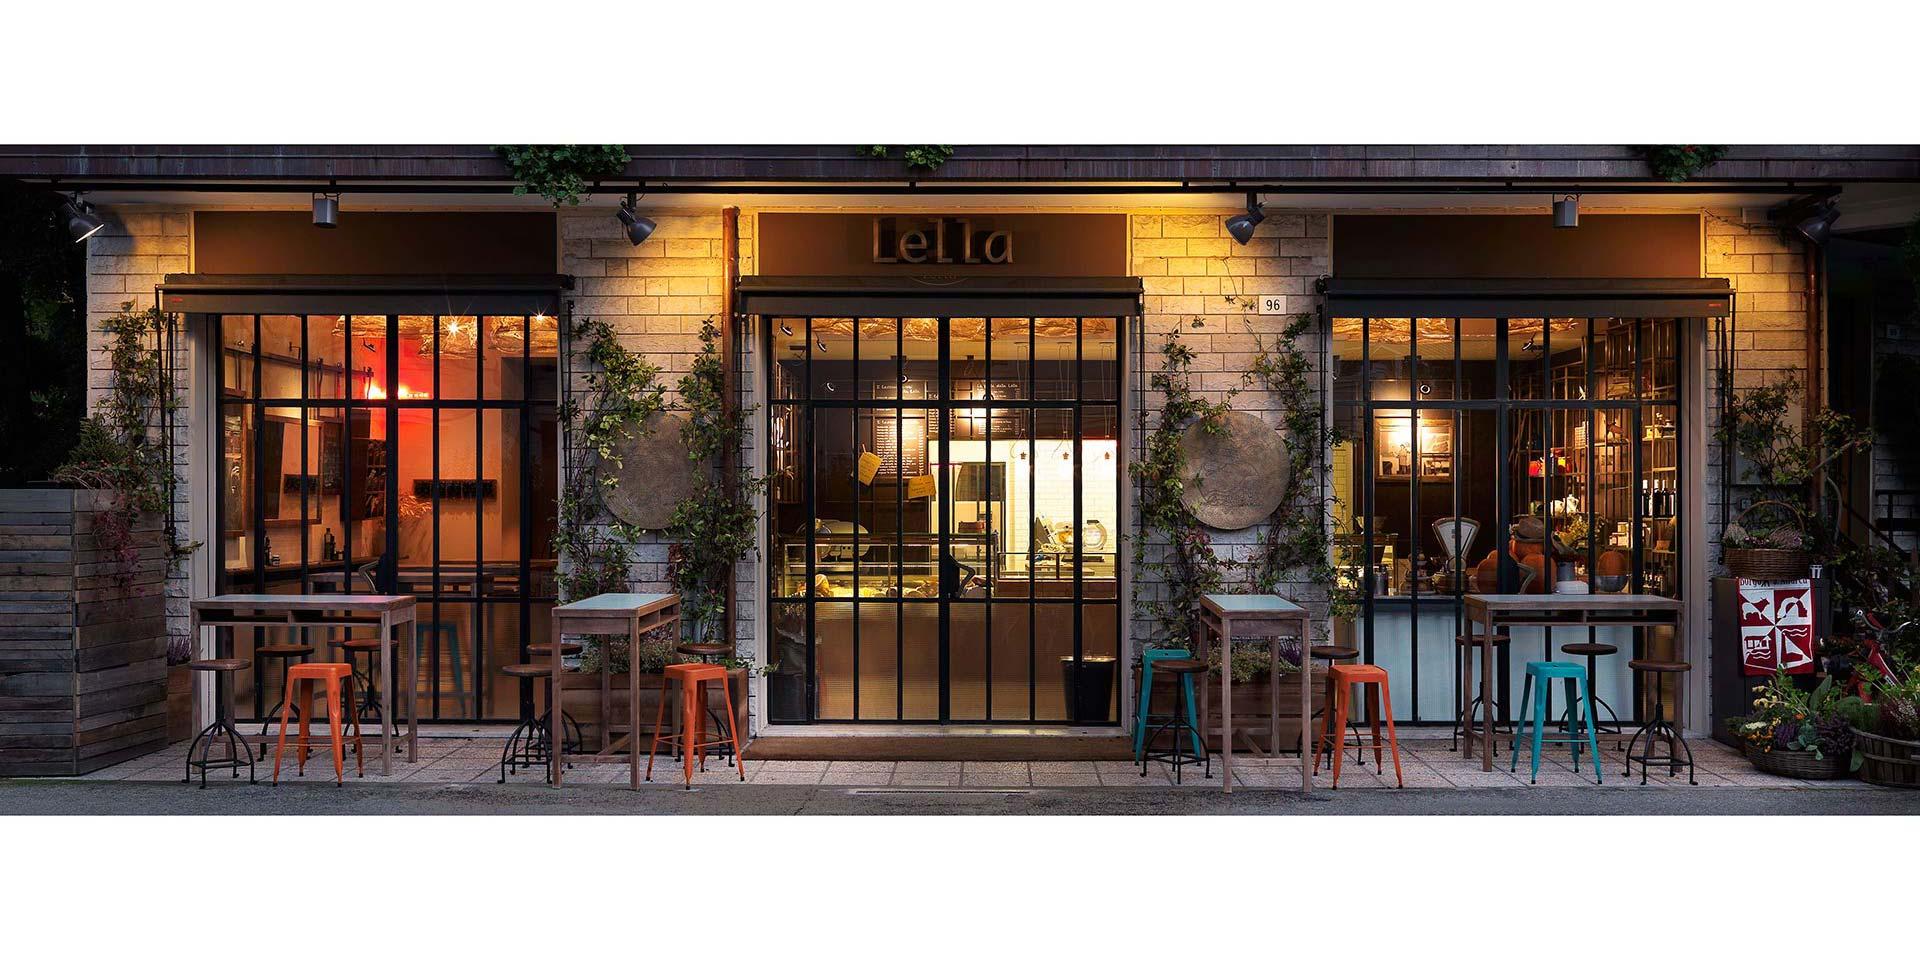 archinow_LEL_street-food-store_11